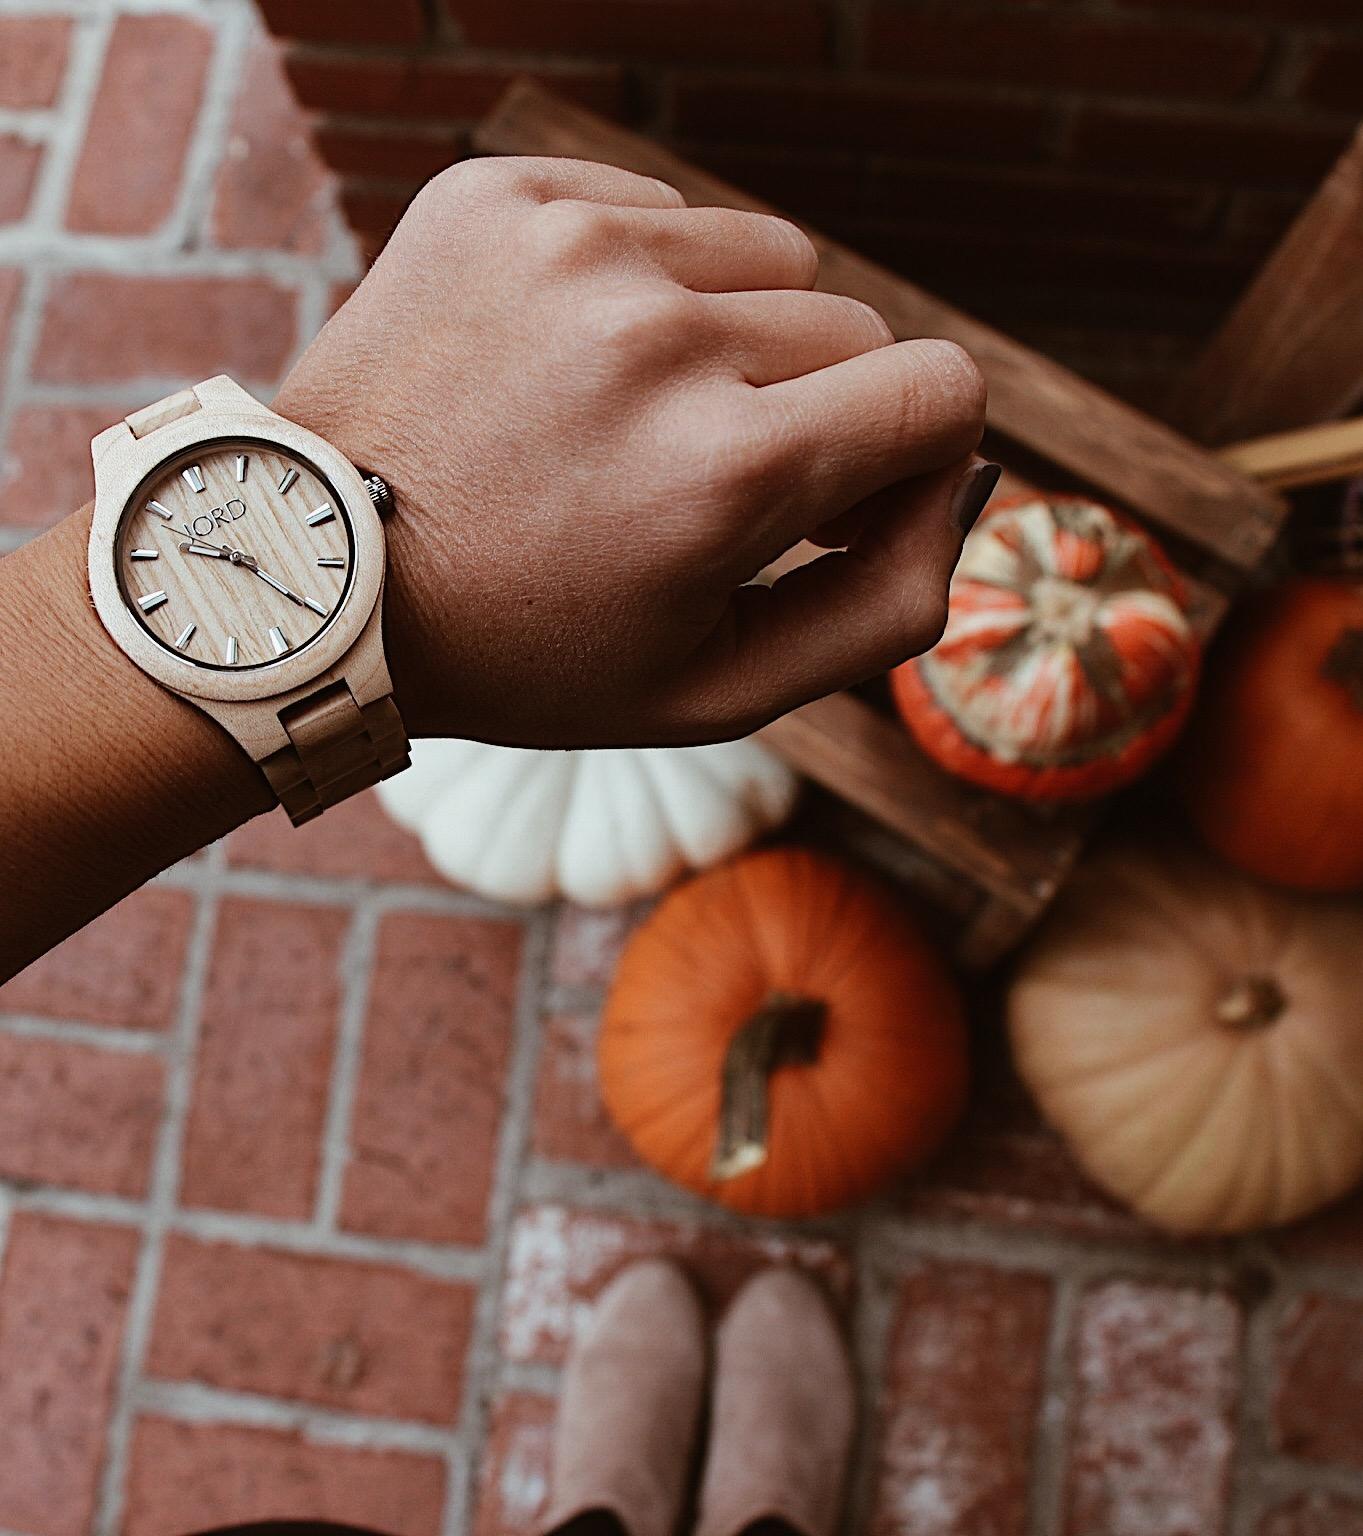 "<!-- JORD WOOD WATCHES ARTICLE WIDGET START -->  <a id=""woodwatches_com_widget_article"" ishidden=""1"" title=""Luxury Wooden Watch"">Luxury Wooden Watch</a>  <script src=""// www.woodwatches.com/widget-article/bysaraisabel "" type=""text/javascript""></script>  <!-- JORD WOOD WATCHES ARTICLE WIDGET END -->"